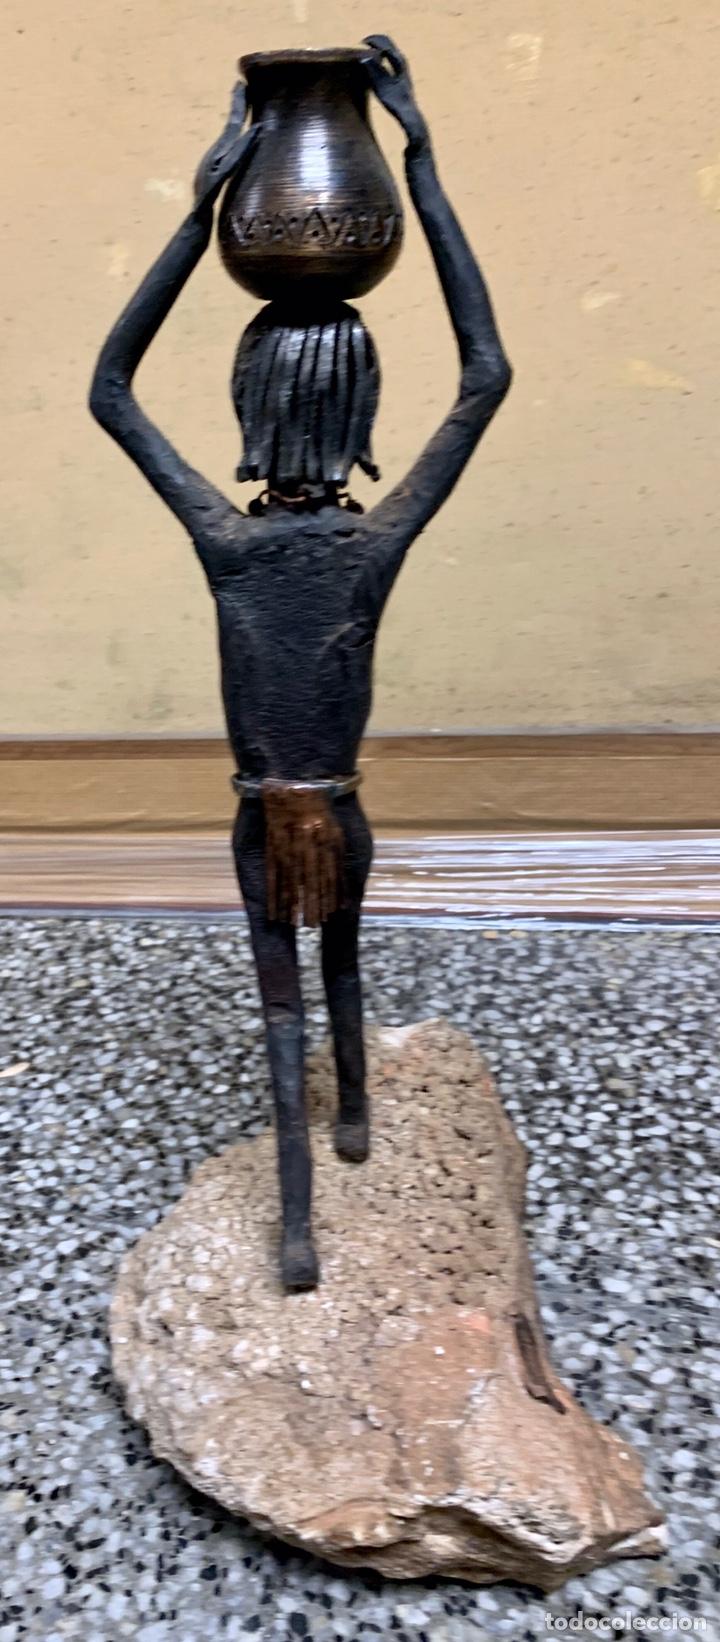 Arte: Josep Muray i Busqué, la Pobla de Claramunt, figura de hierro forjado, 44 cm de altura total - Foto 4 - 221623252